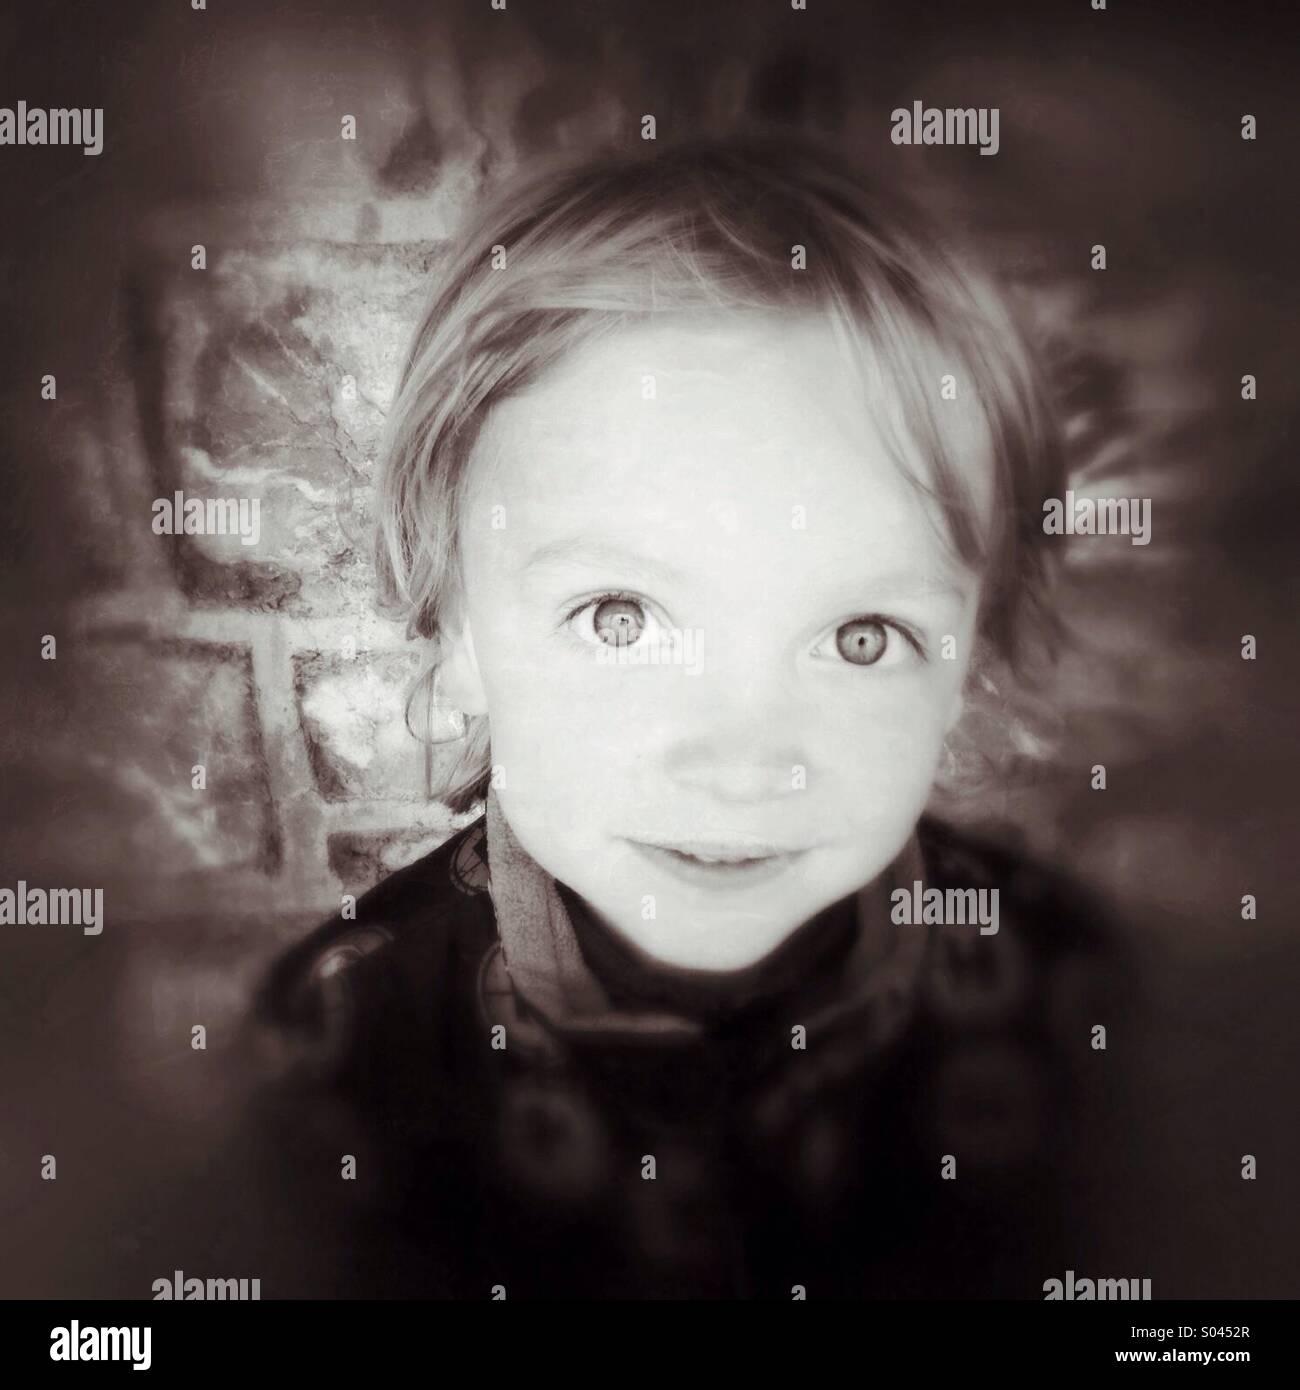 Retrato de un niño Imagen De Stock